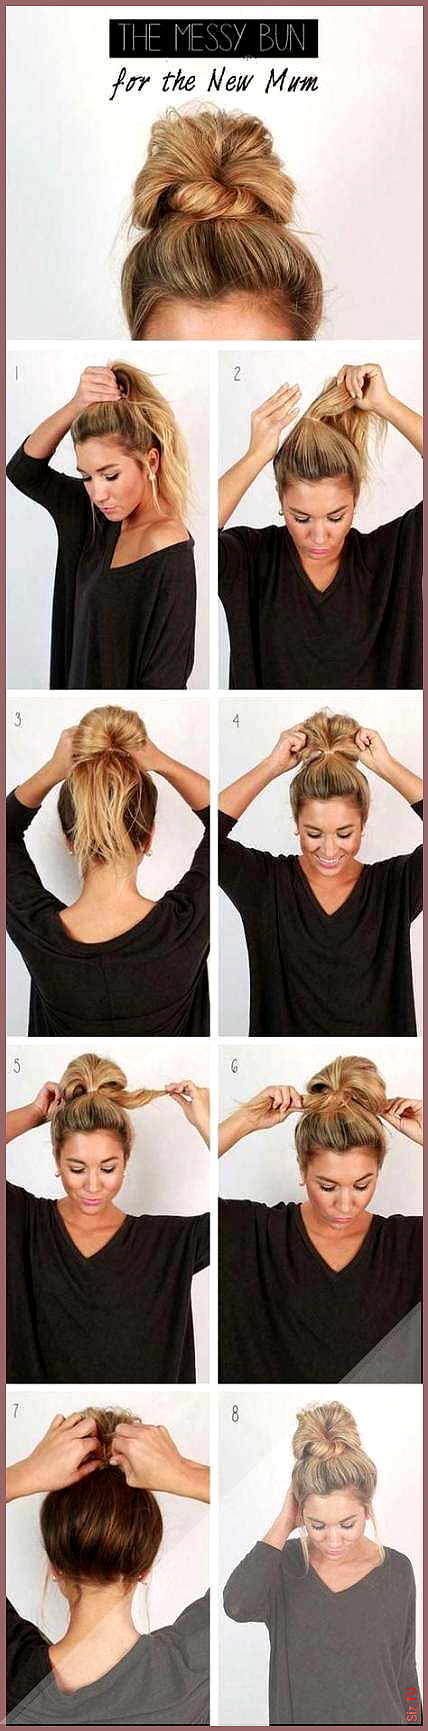 46 Super Ideas For Hair Styles For School Medium H Buns Hair Ideas Knot Medium Messy Messy Bun Top Knot Cool Easy Hairstyles Easy Hairdos Easy Updo Hairstyles